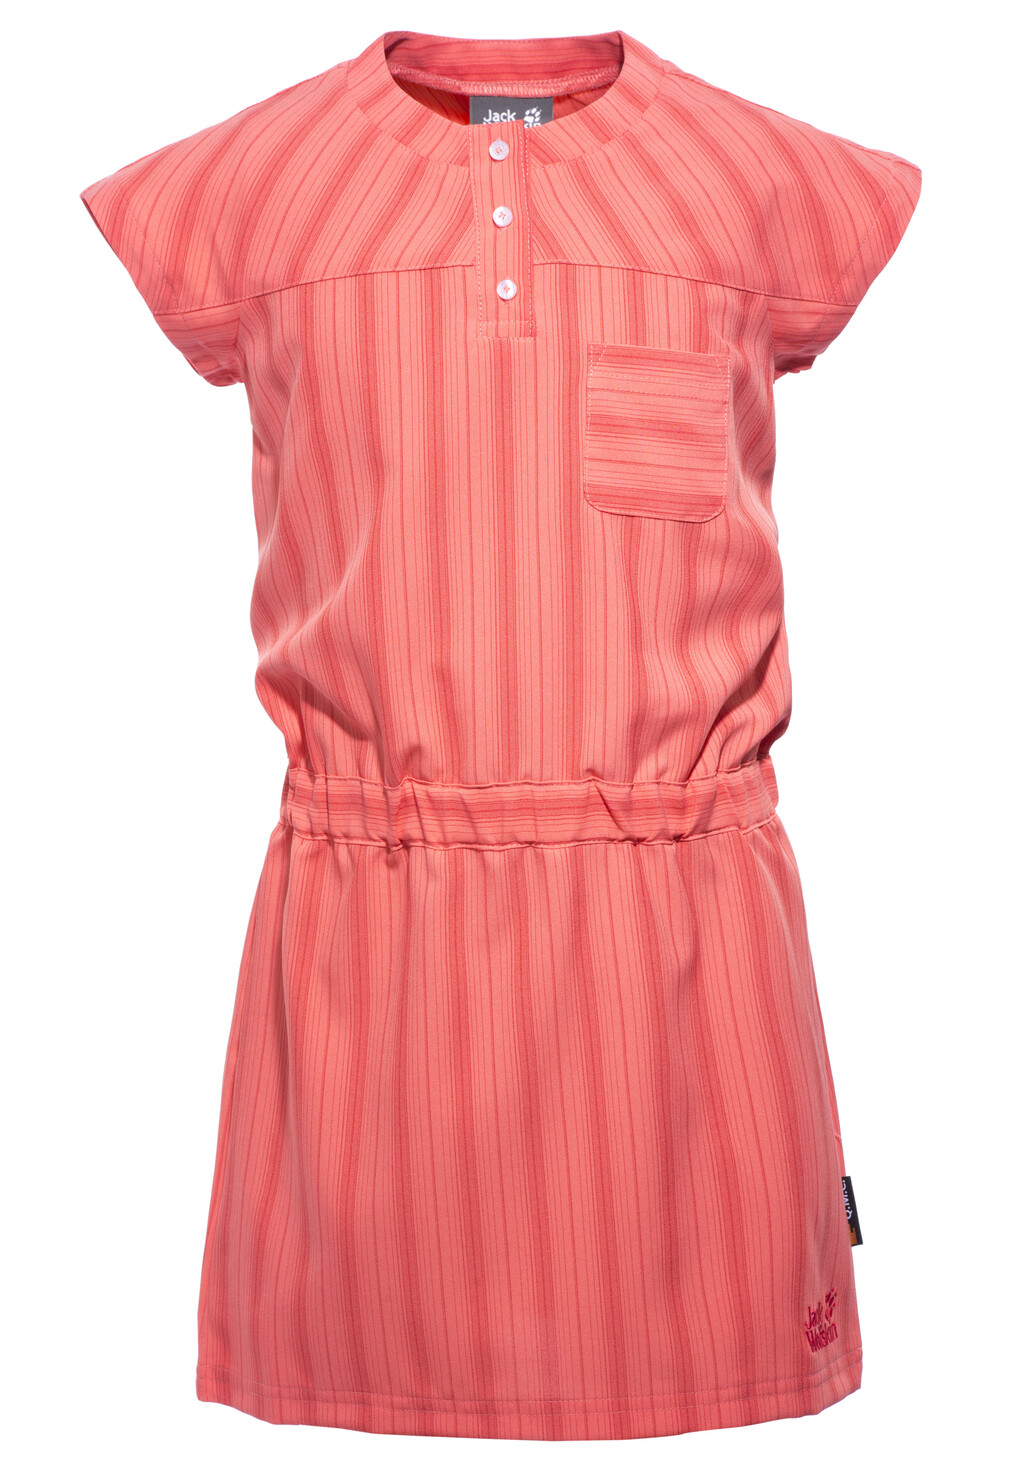 Jack Wolfskin Airy Summer Dress Girls grapefruit stripes 104 Kleid~Rock~Bekleidung~outdoor~kinderbekleidung~outdoor kleid~outdoor rock~outdoor kleid mädchen~outdoor rock mädchen~kleid mädchen~rock mädchen